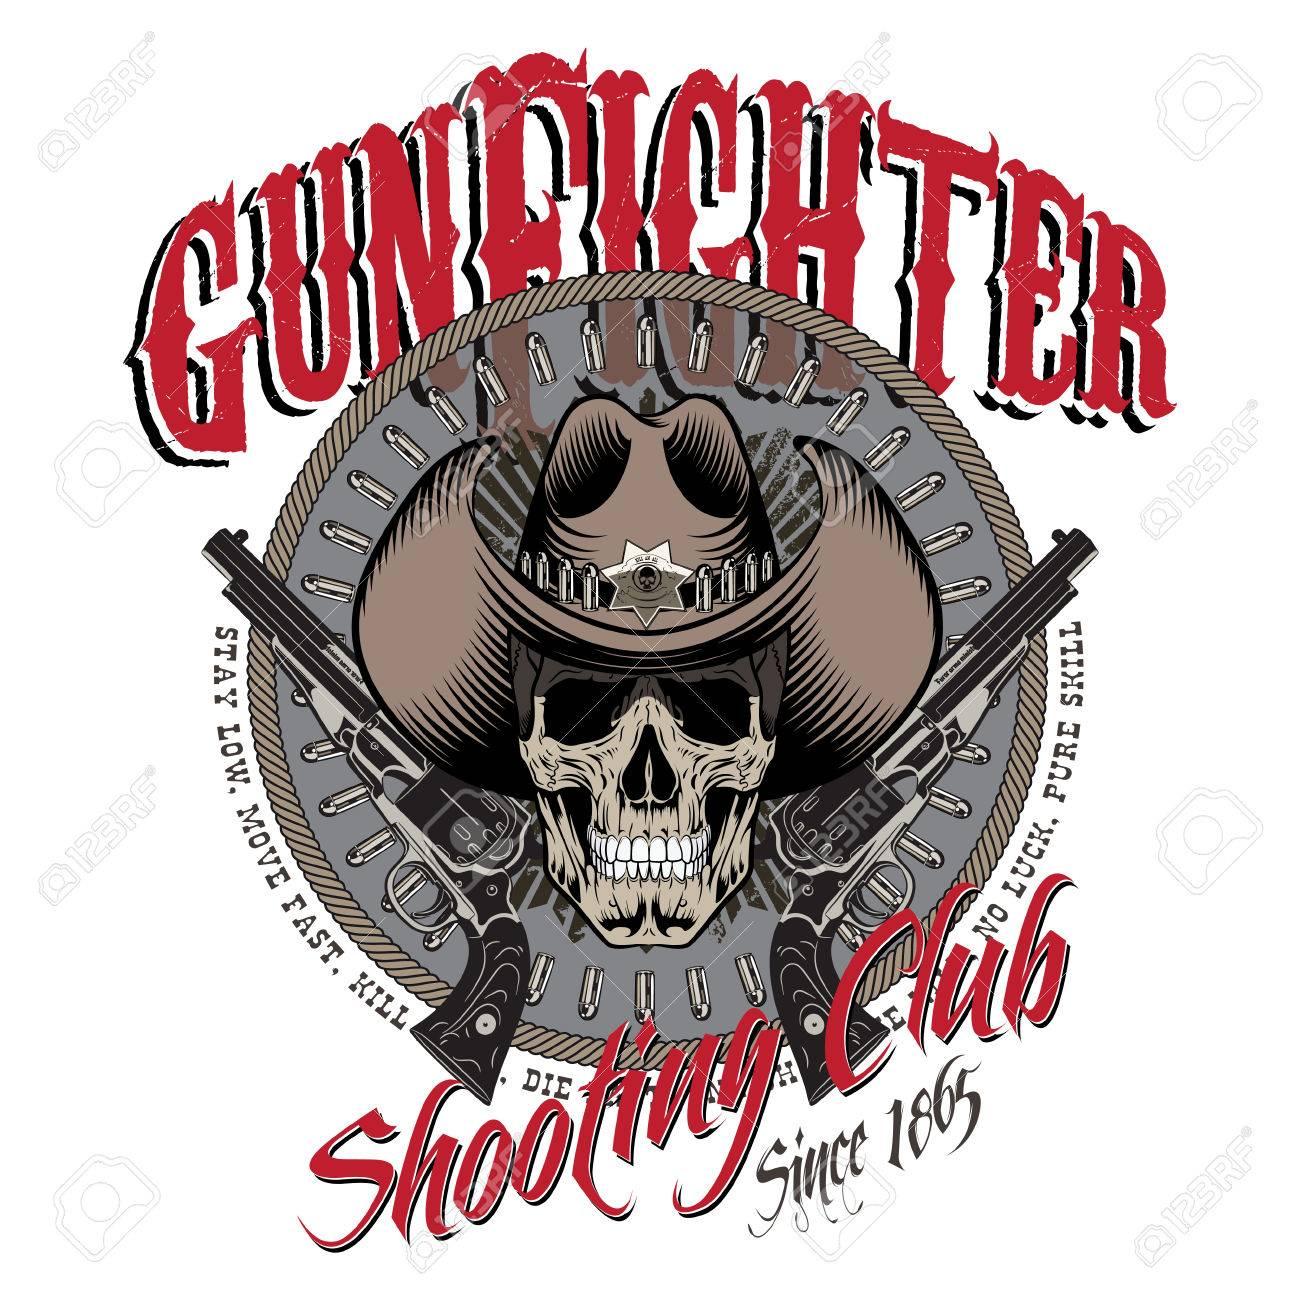 c620cb6b7a7 Design Gunfighter. Skull In Cowboy Hat